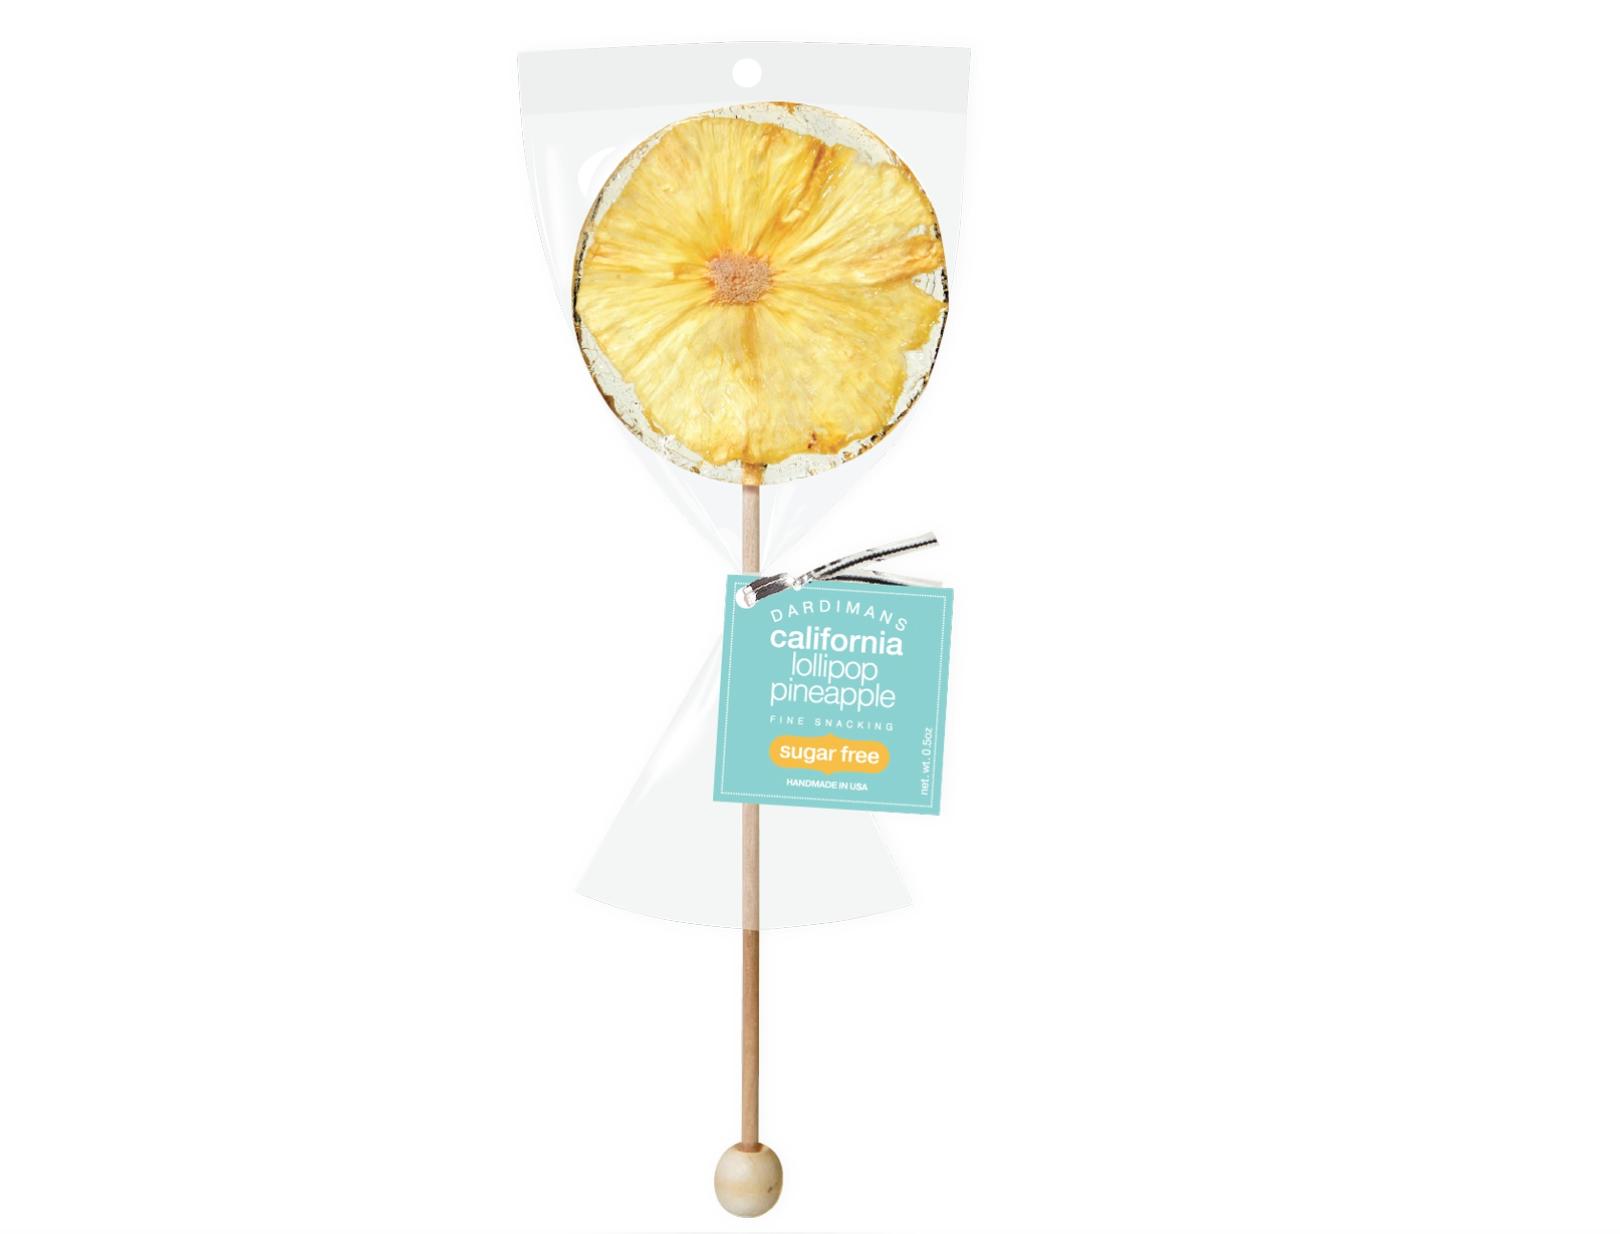 Dardimans Pineapple Lollipop